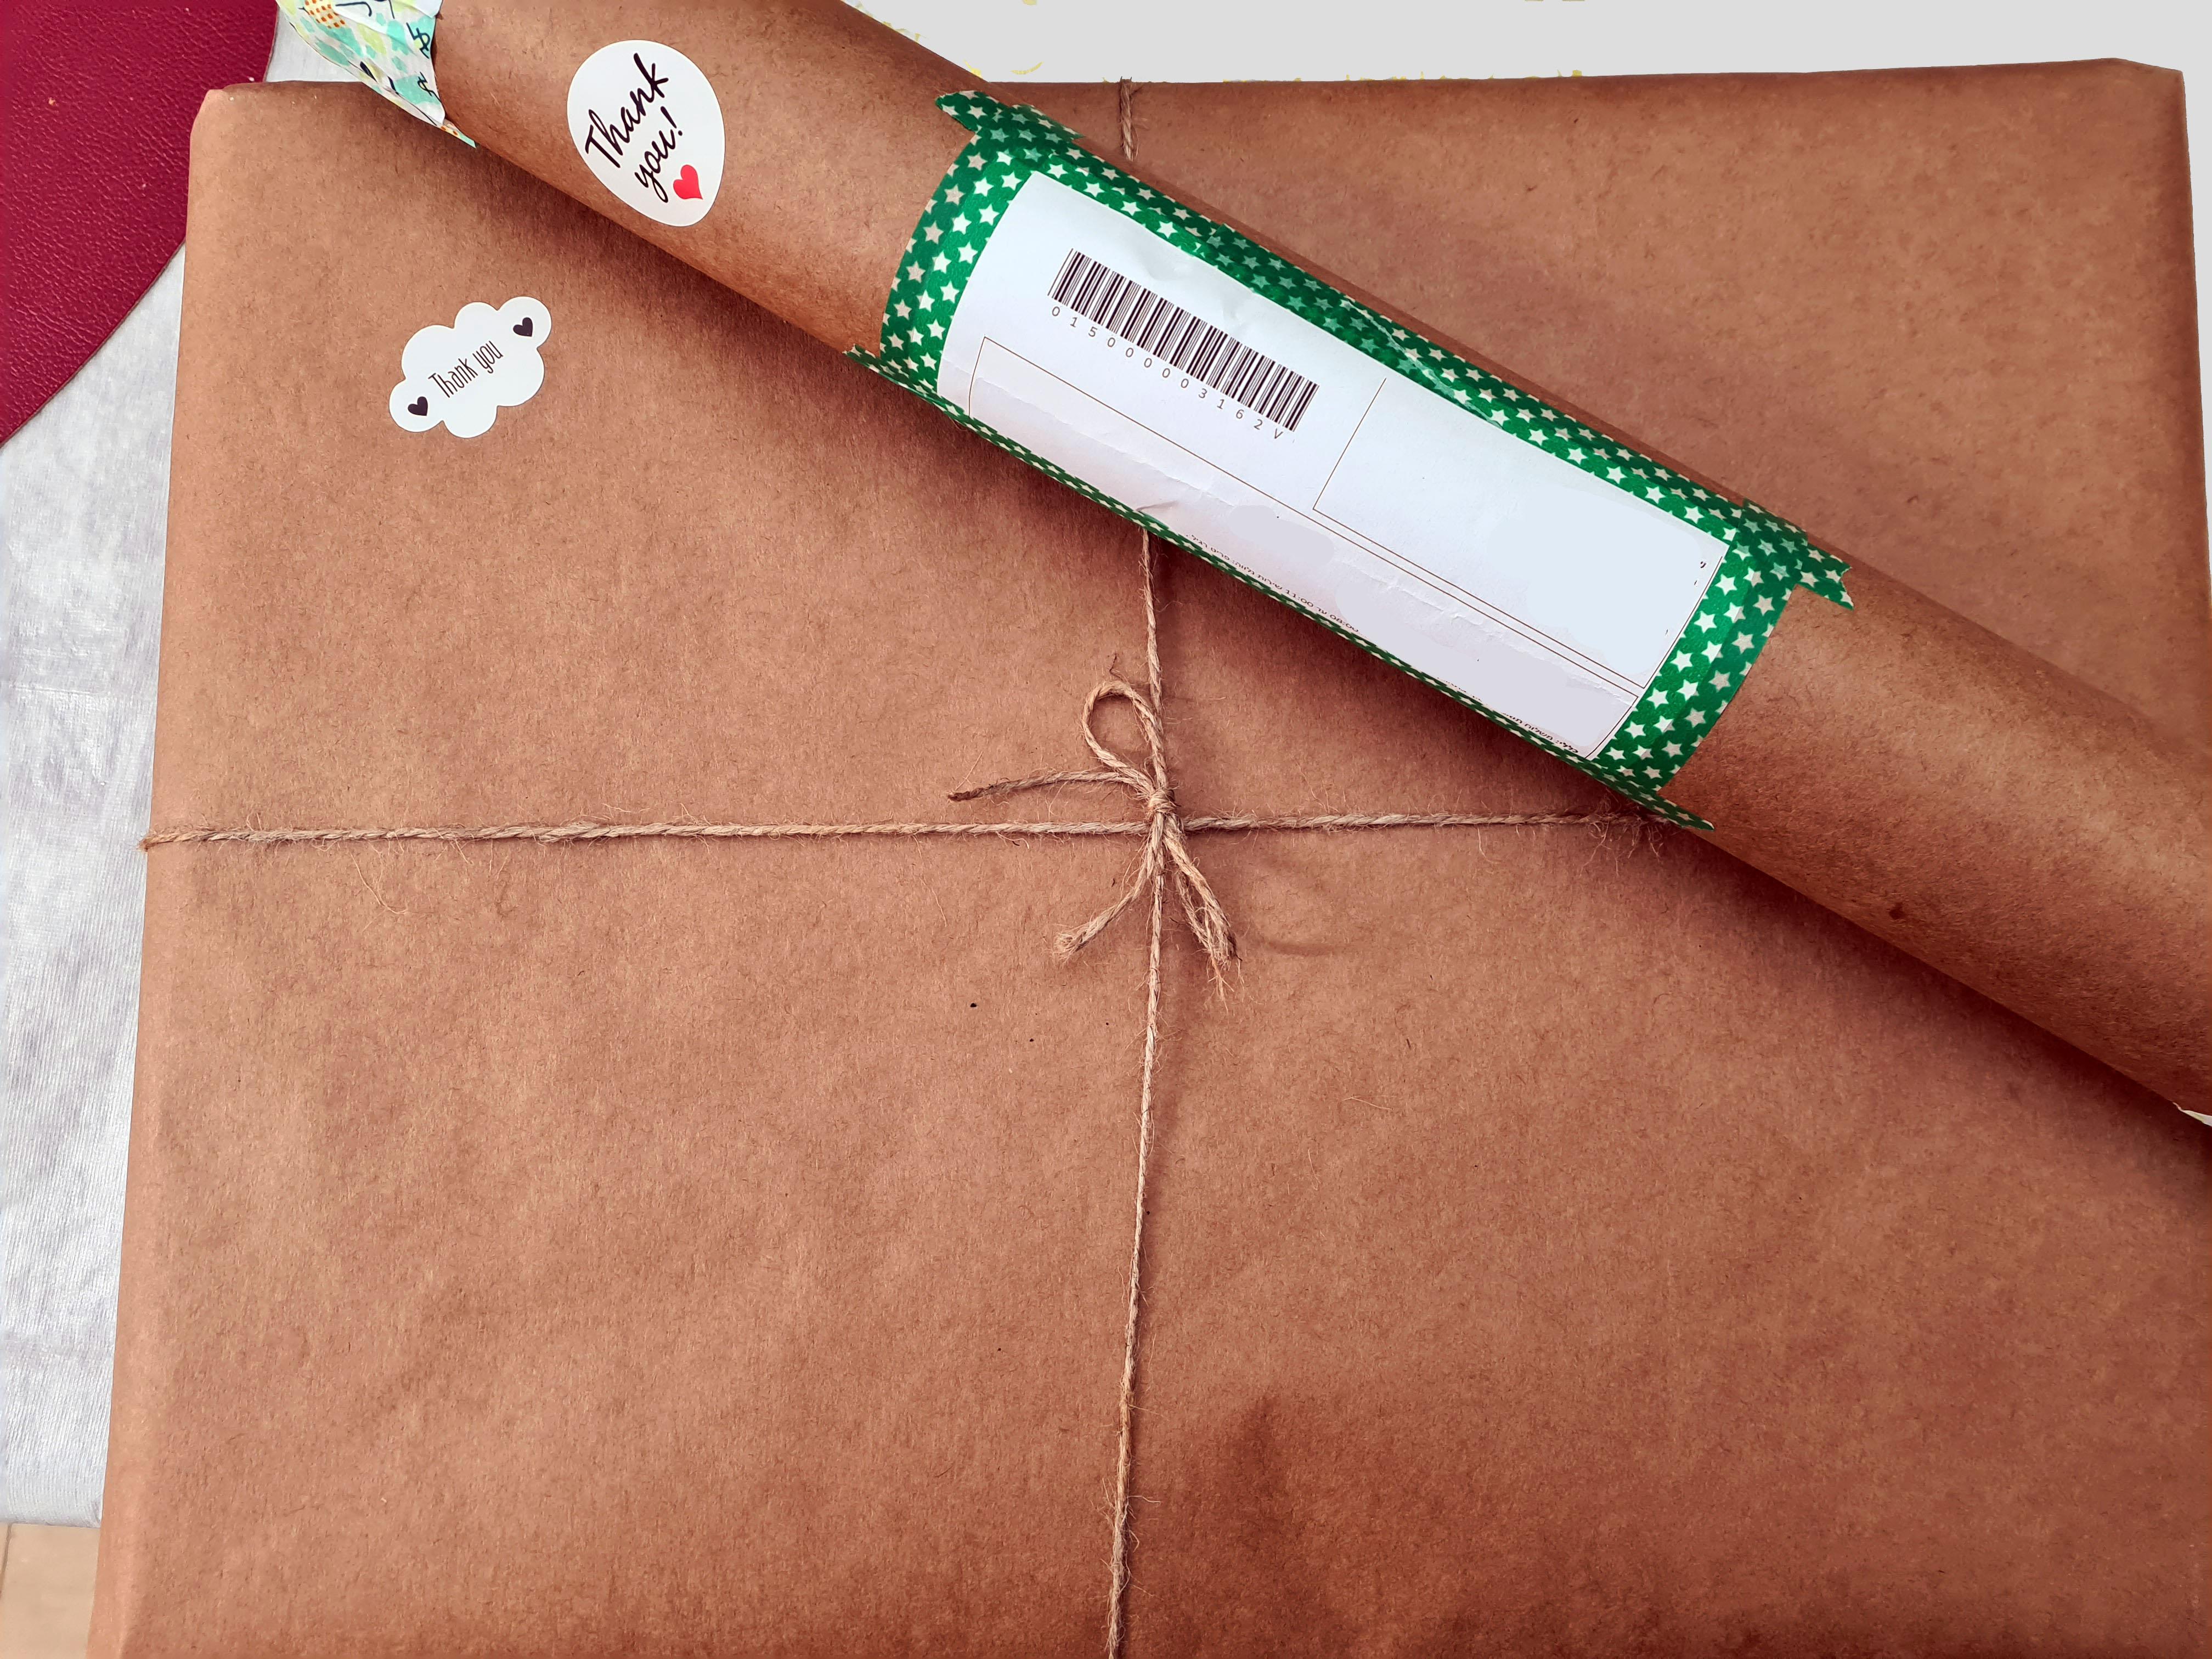 gula design פוסטרים לצביעה וערכות יצירה.